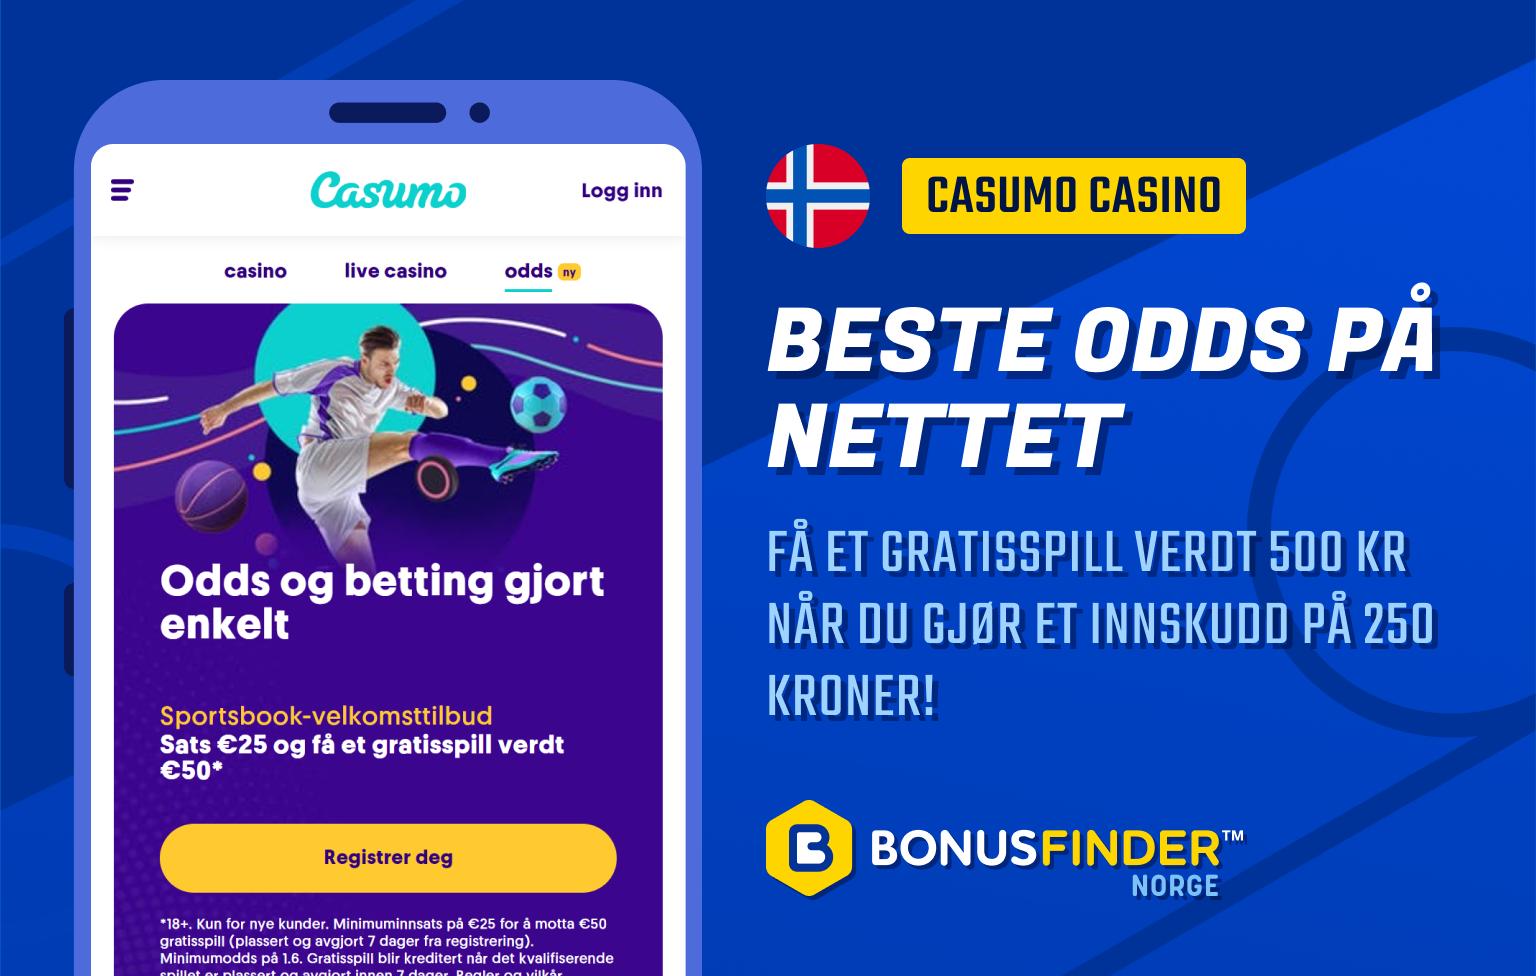 casumo casino odds